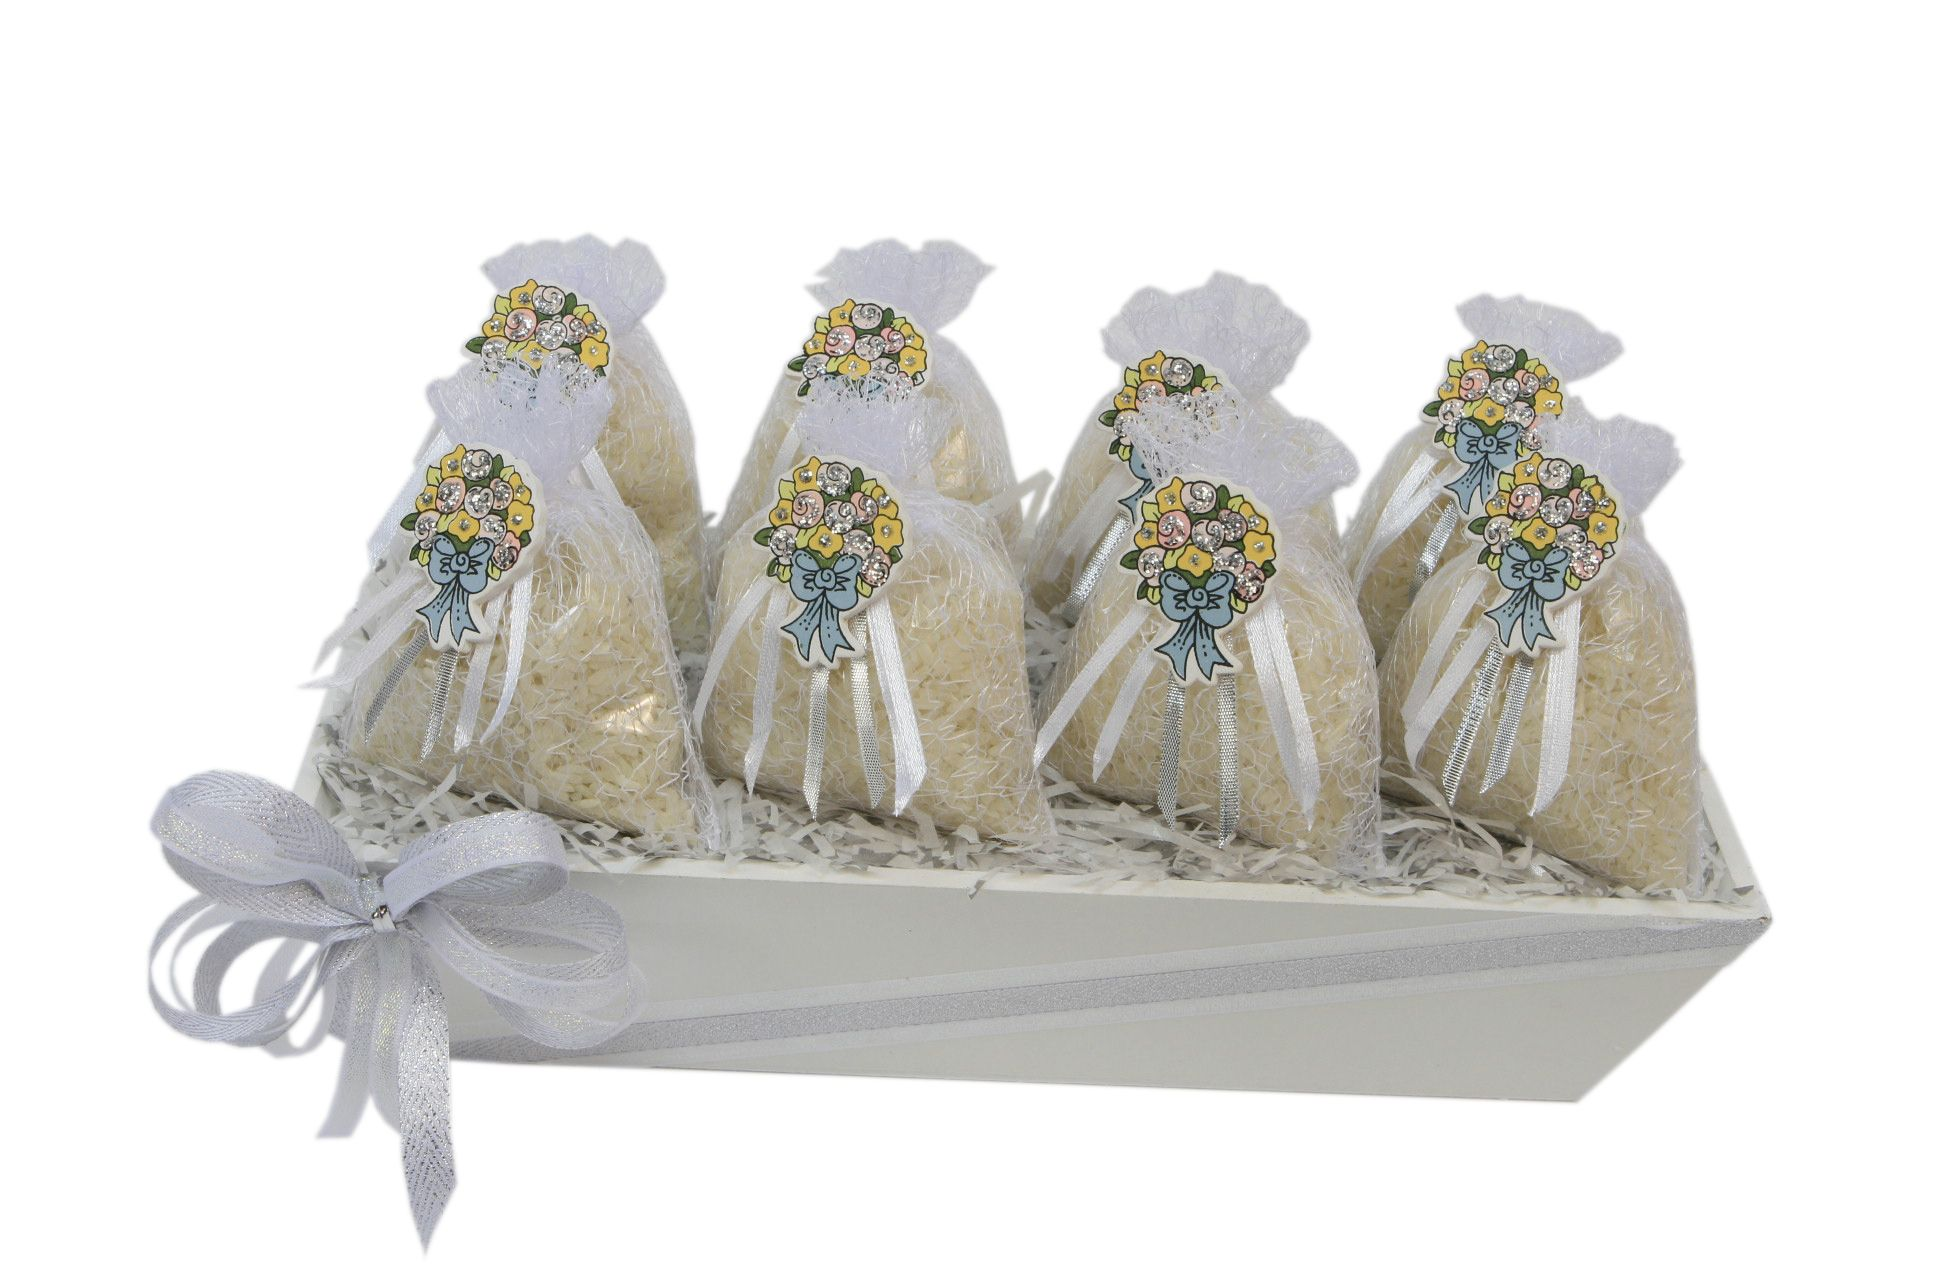 798044288 Recuerdos para boda. Base de madera con bolsas de organza color blanco